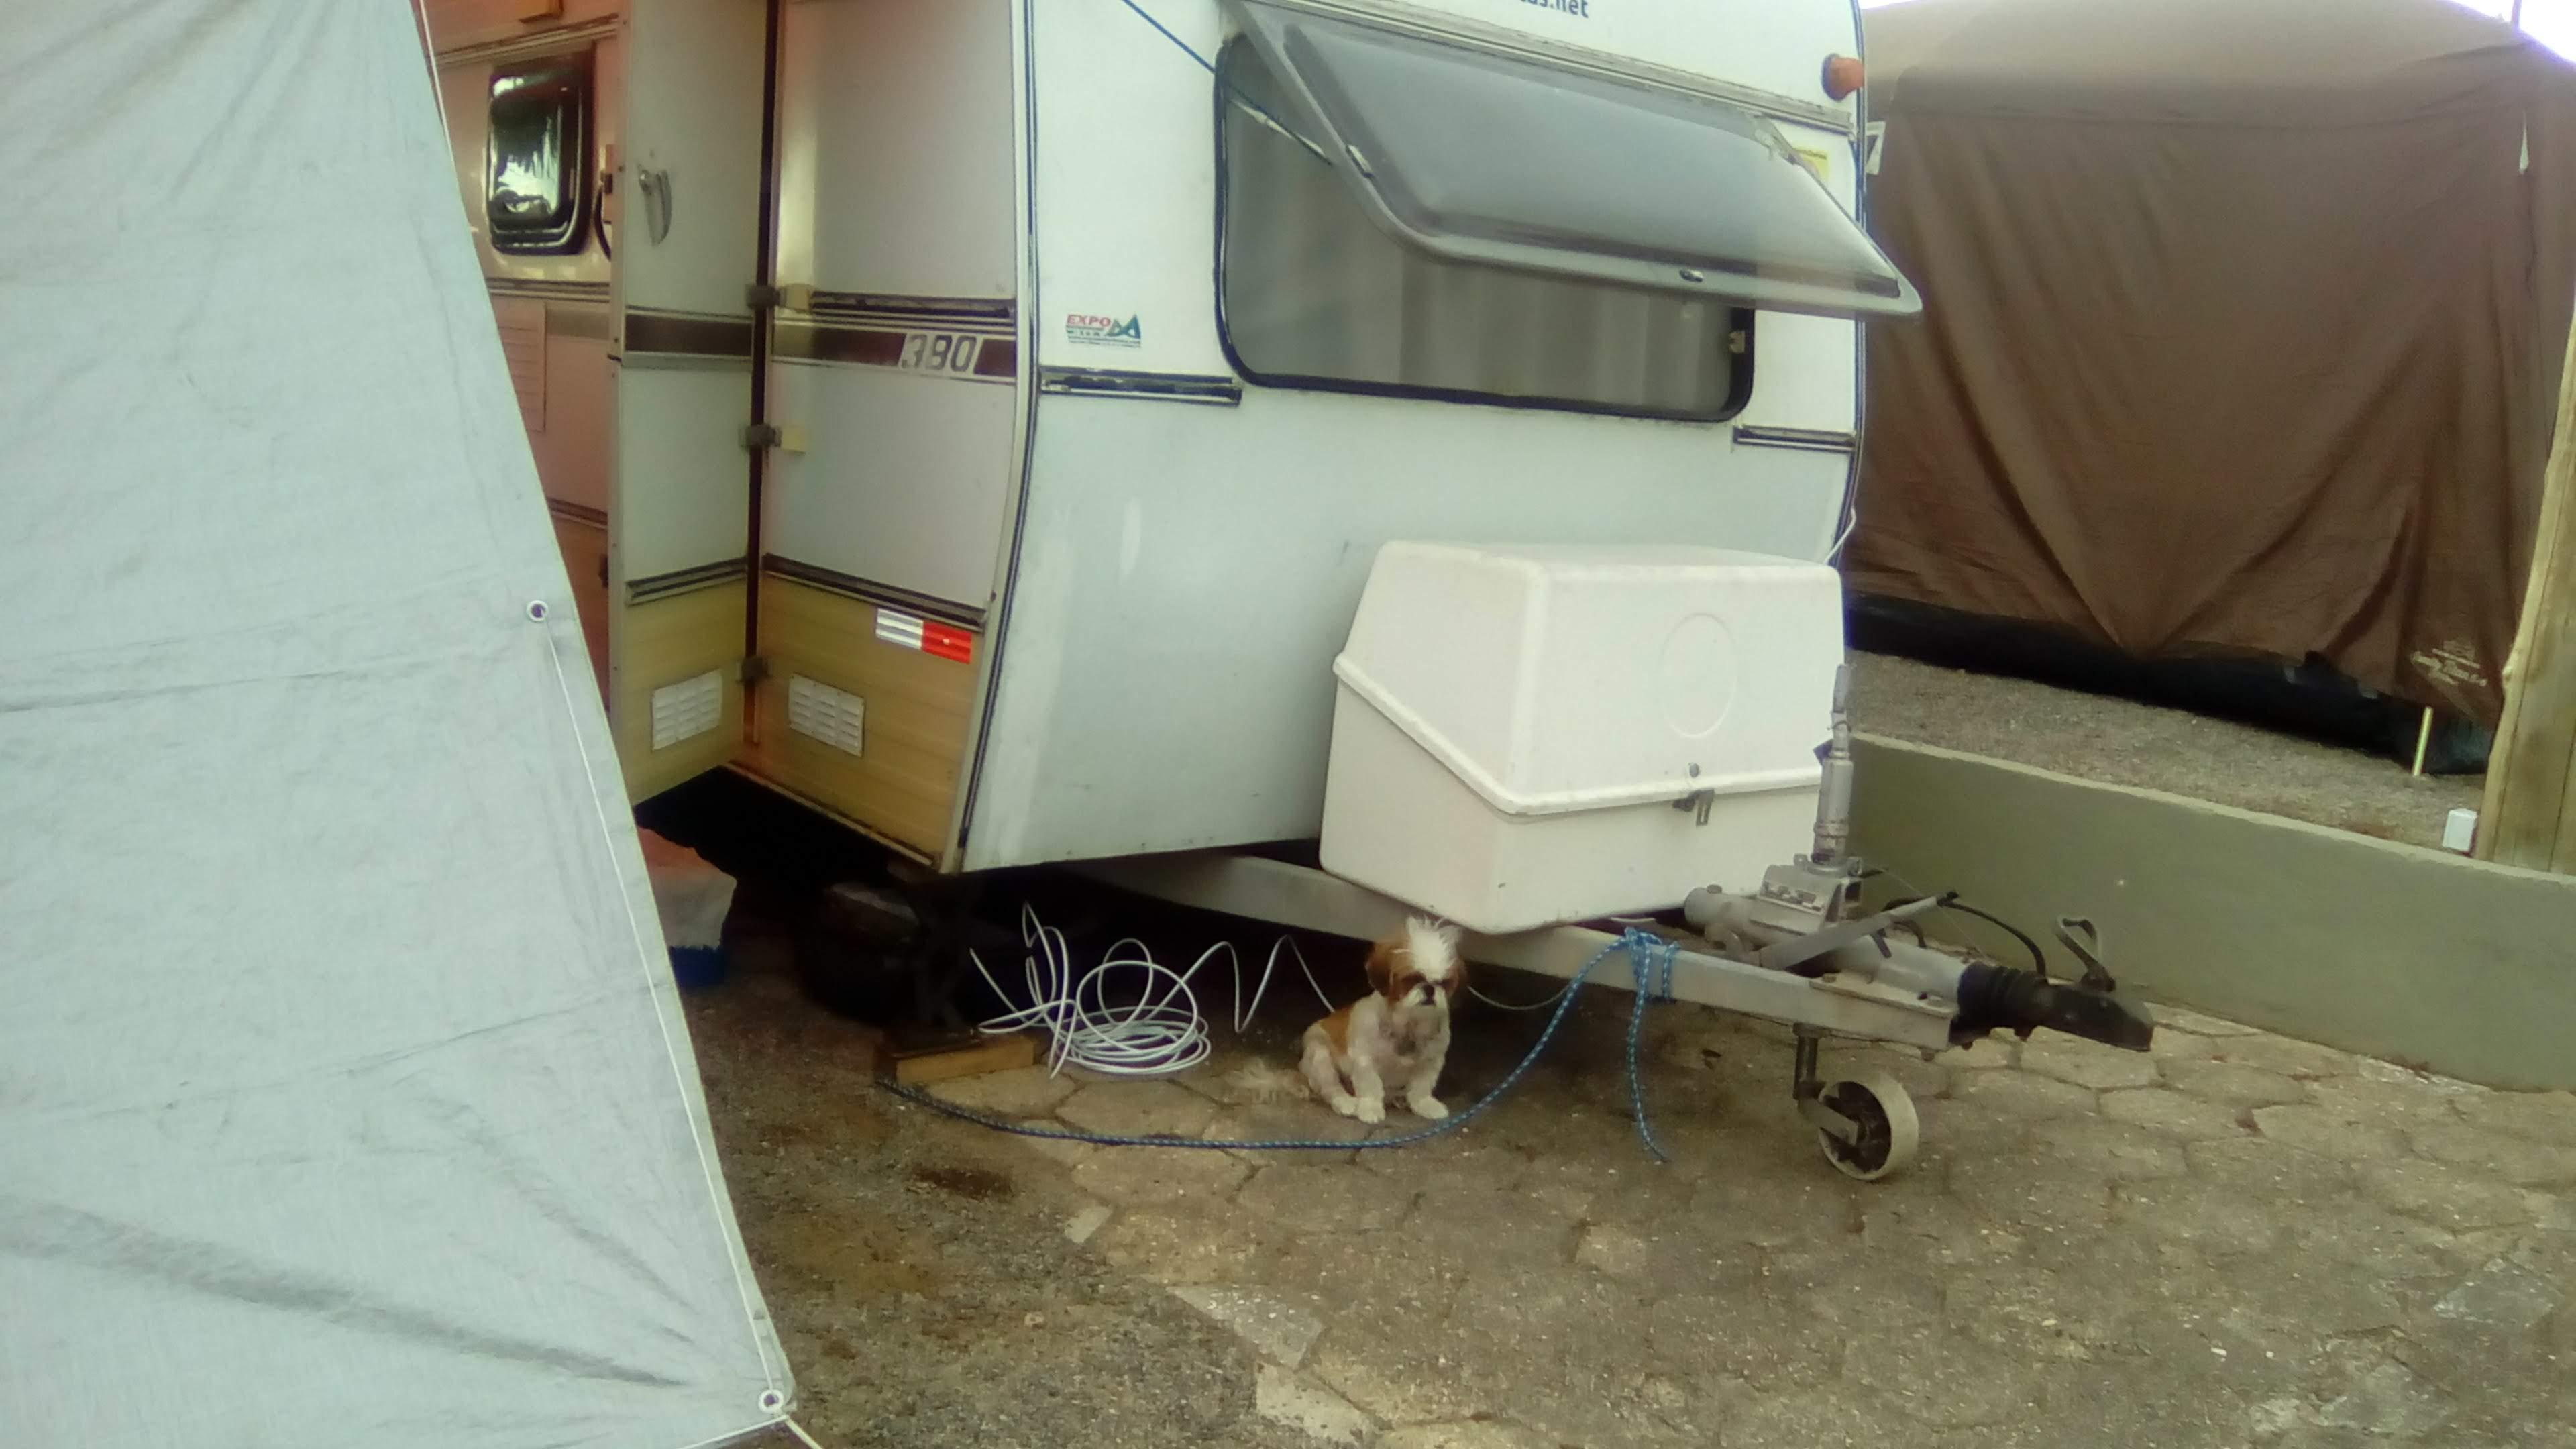 Cindy cuidando do acampamento enquanto o desmontamos.